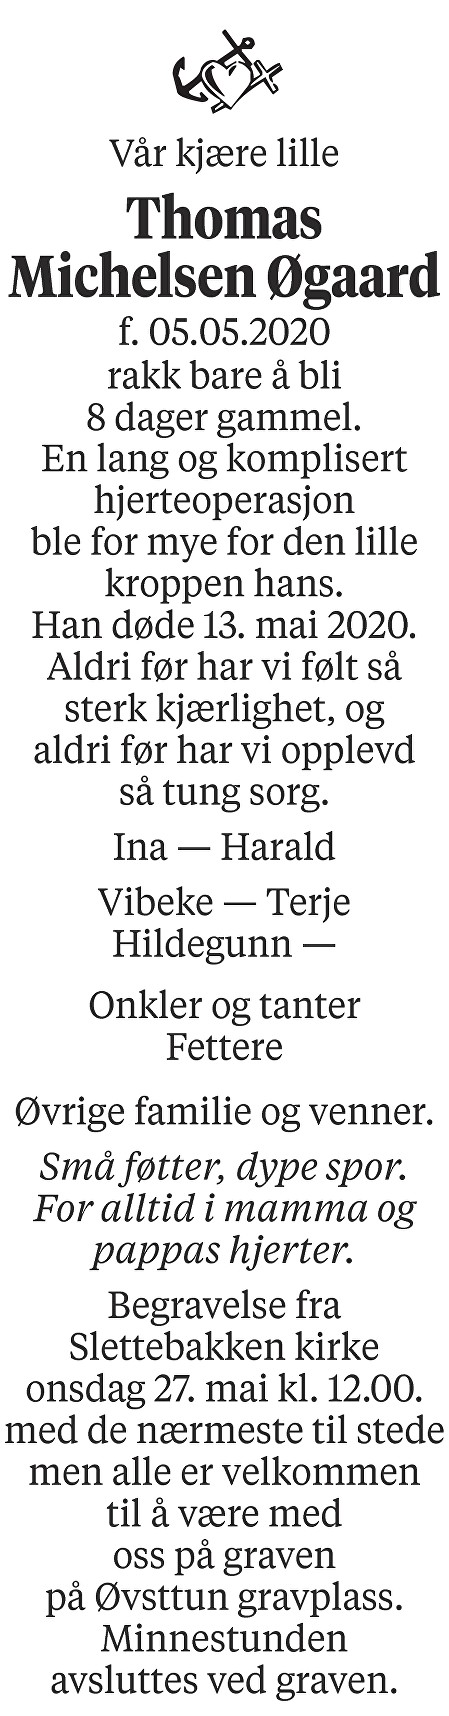 Thomas Michelsen Øgaard Dødsannonse